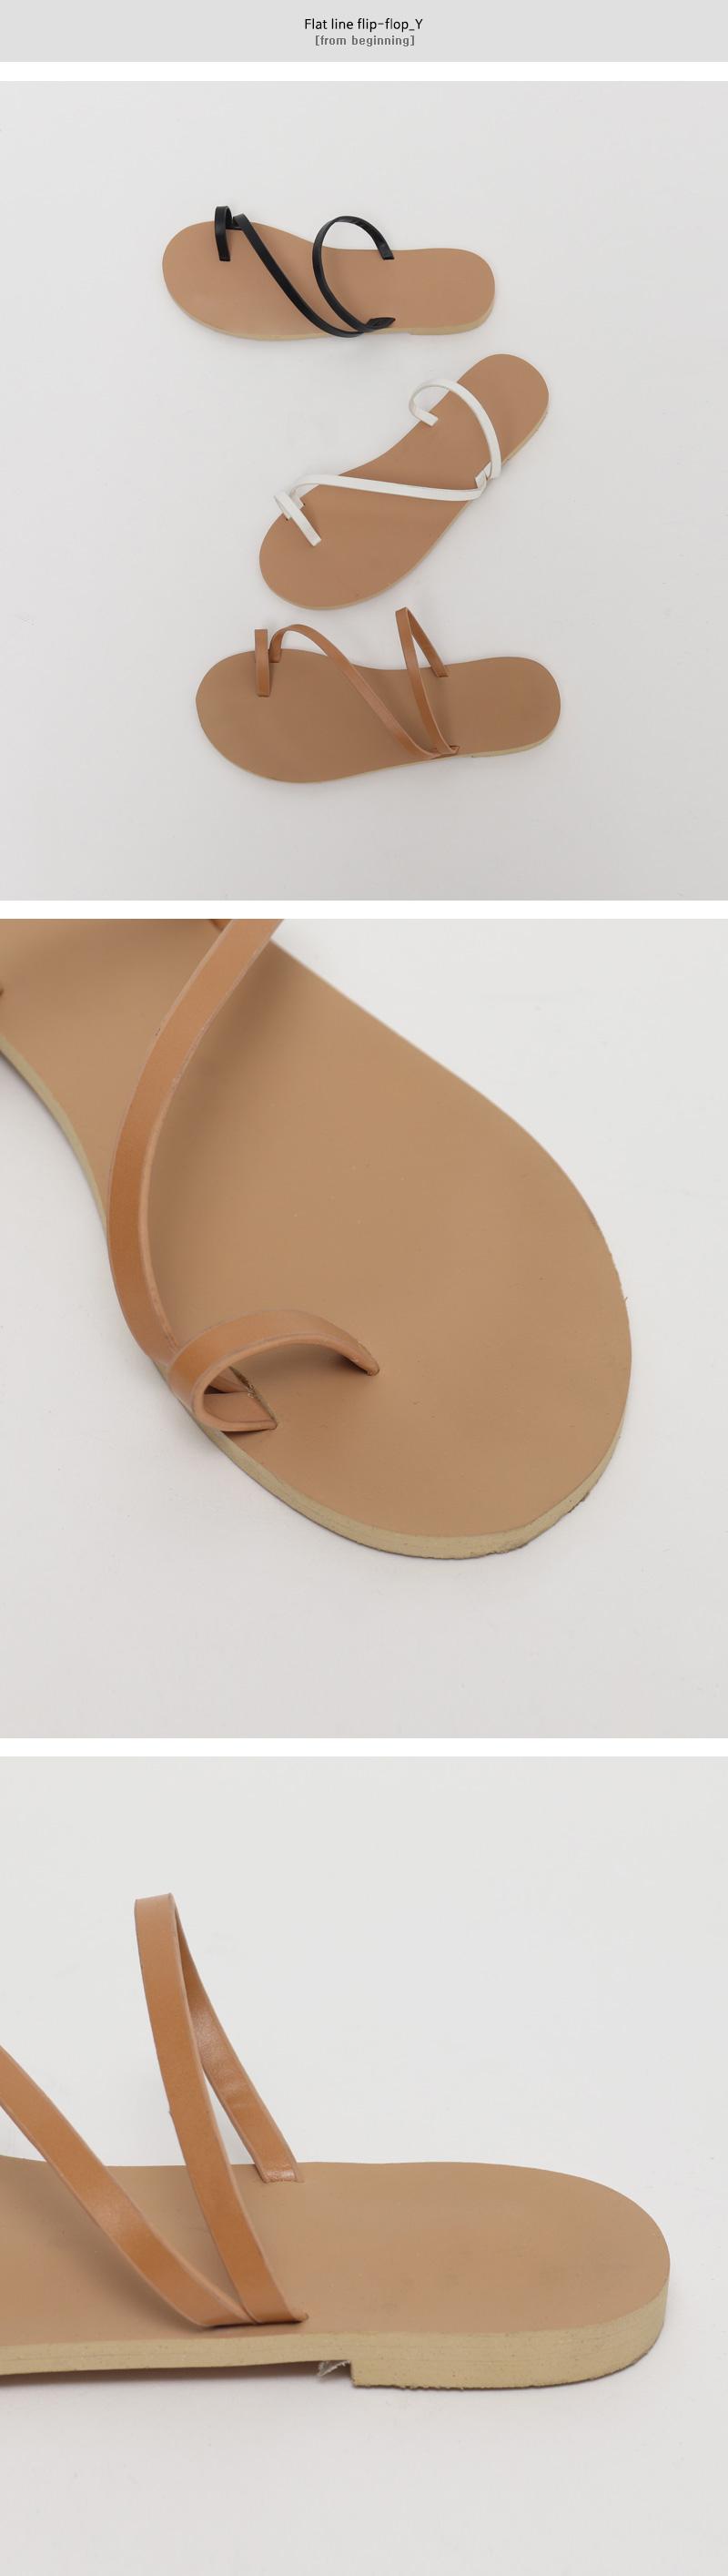 Flat line flip-flop_Y